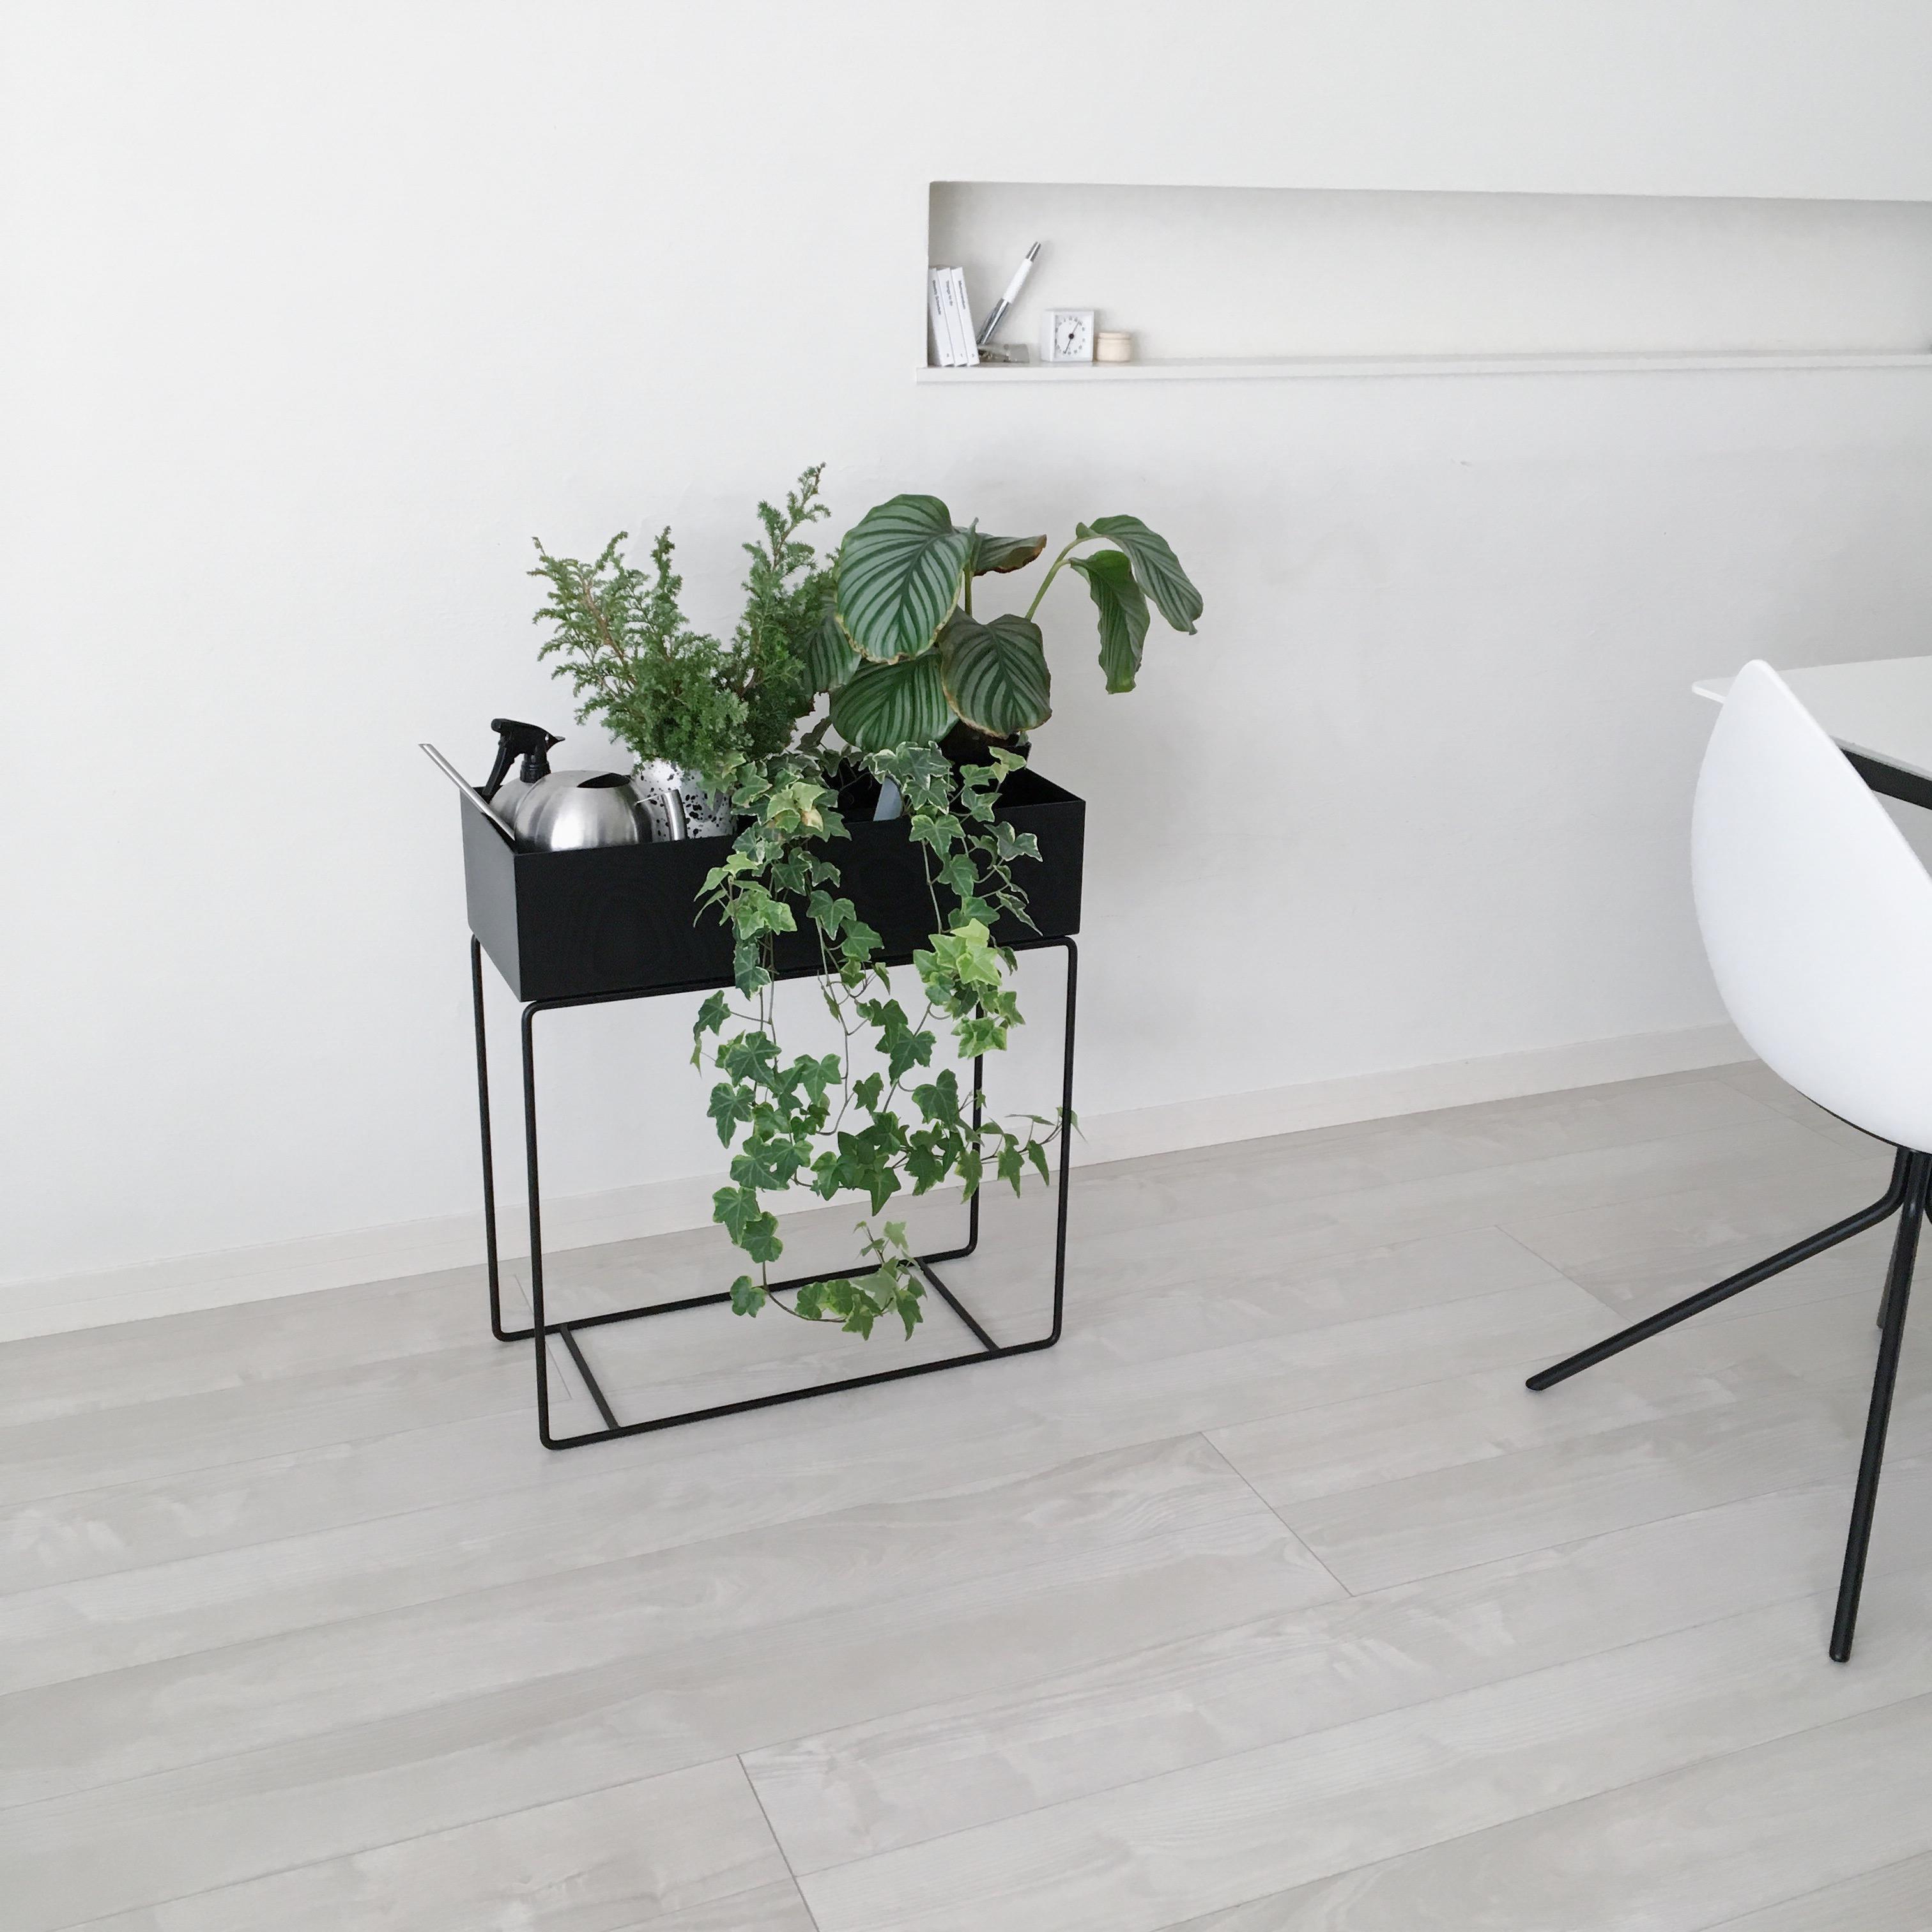 ferm living「plant box」